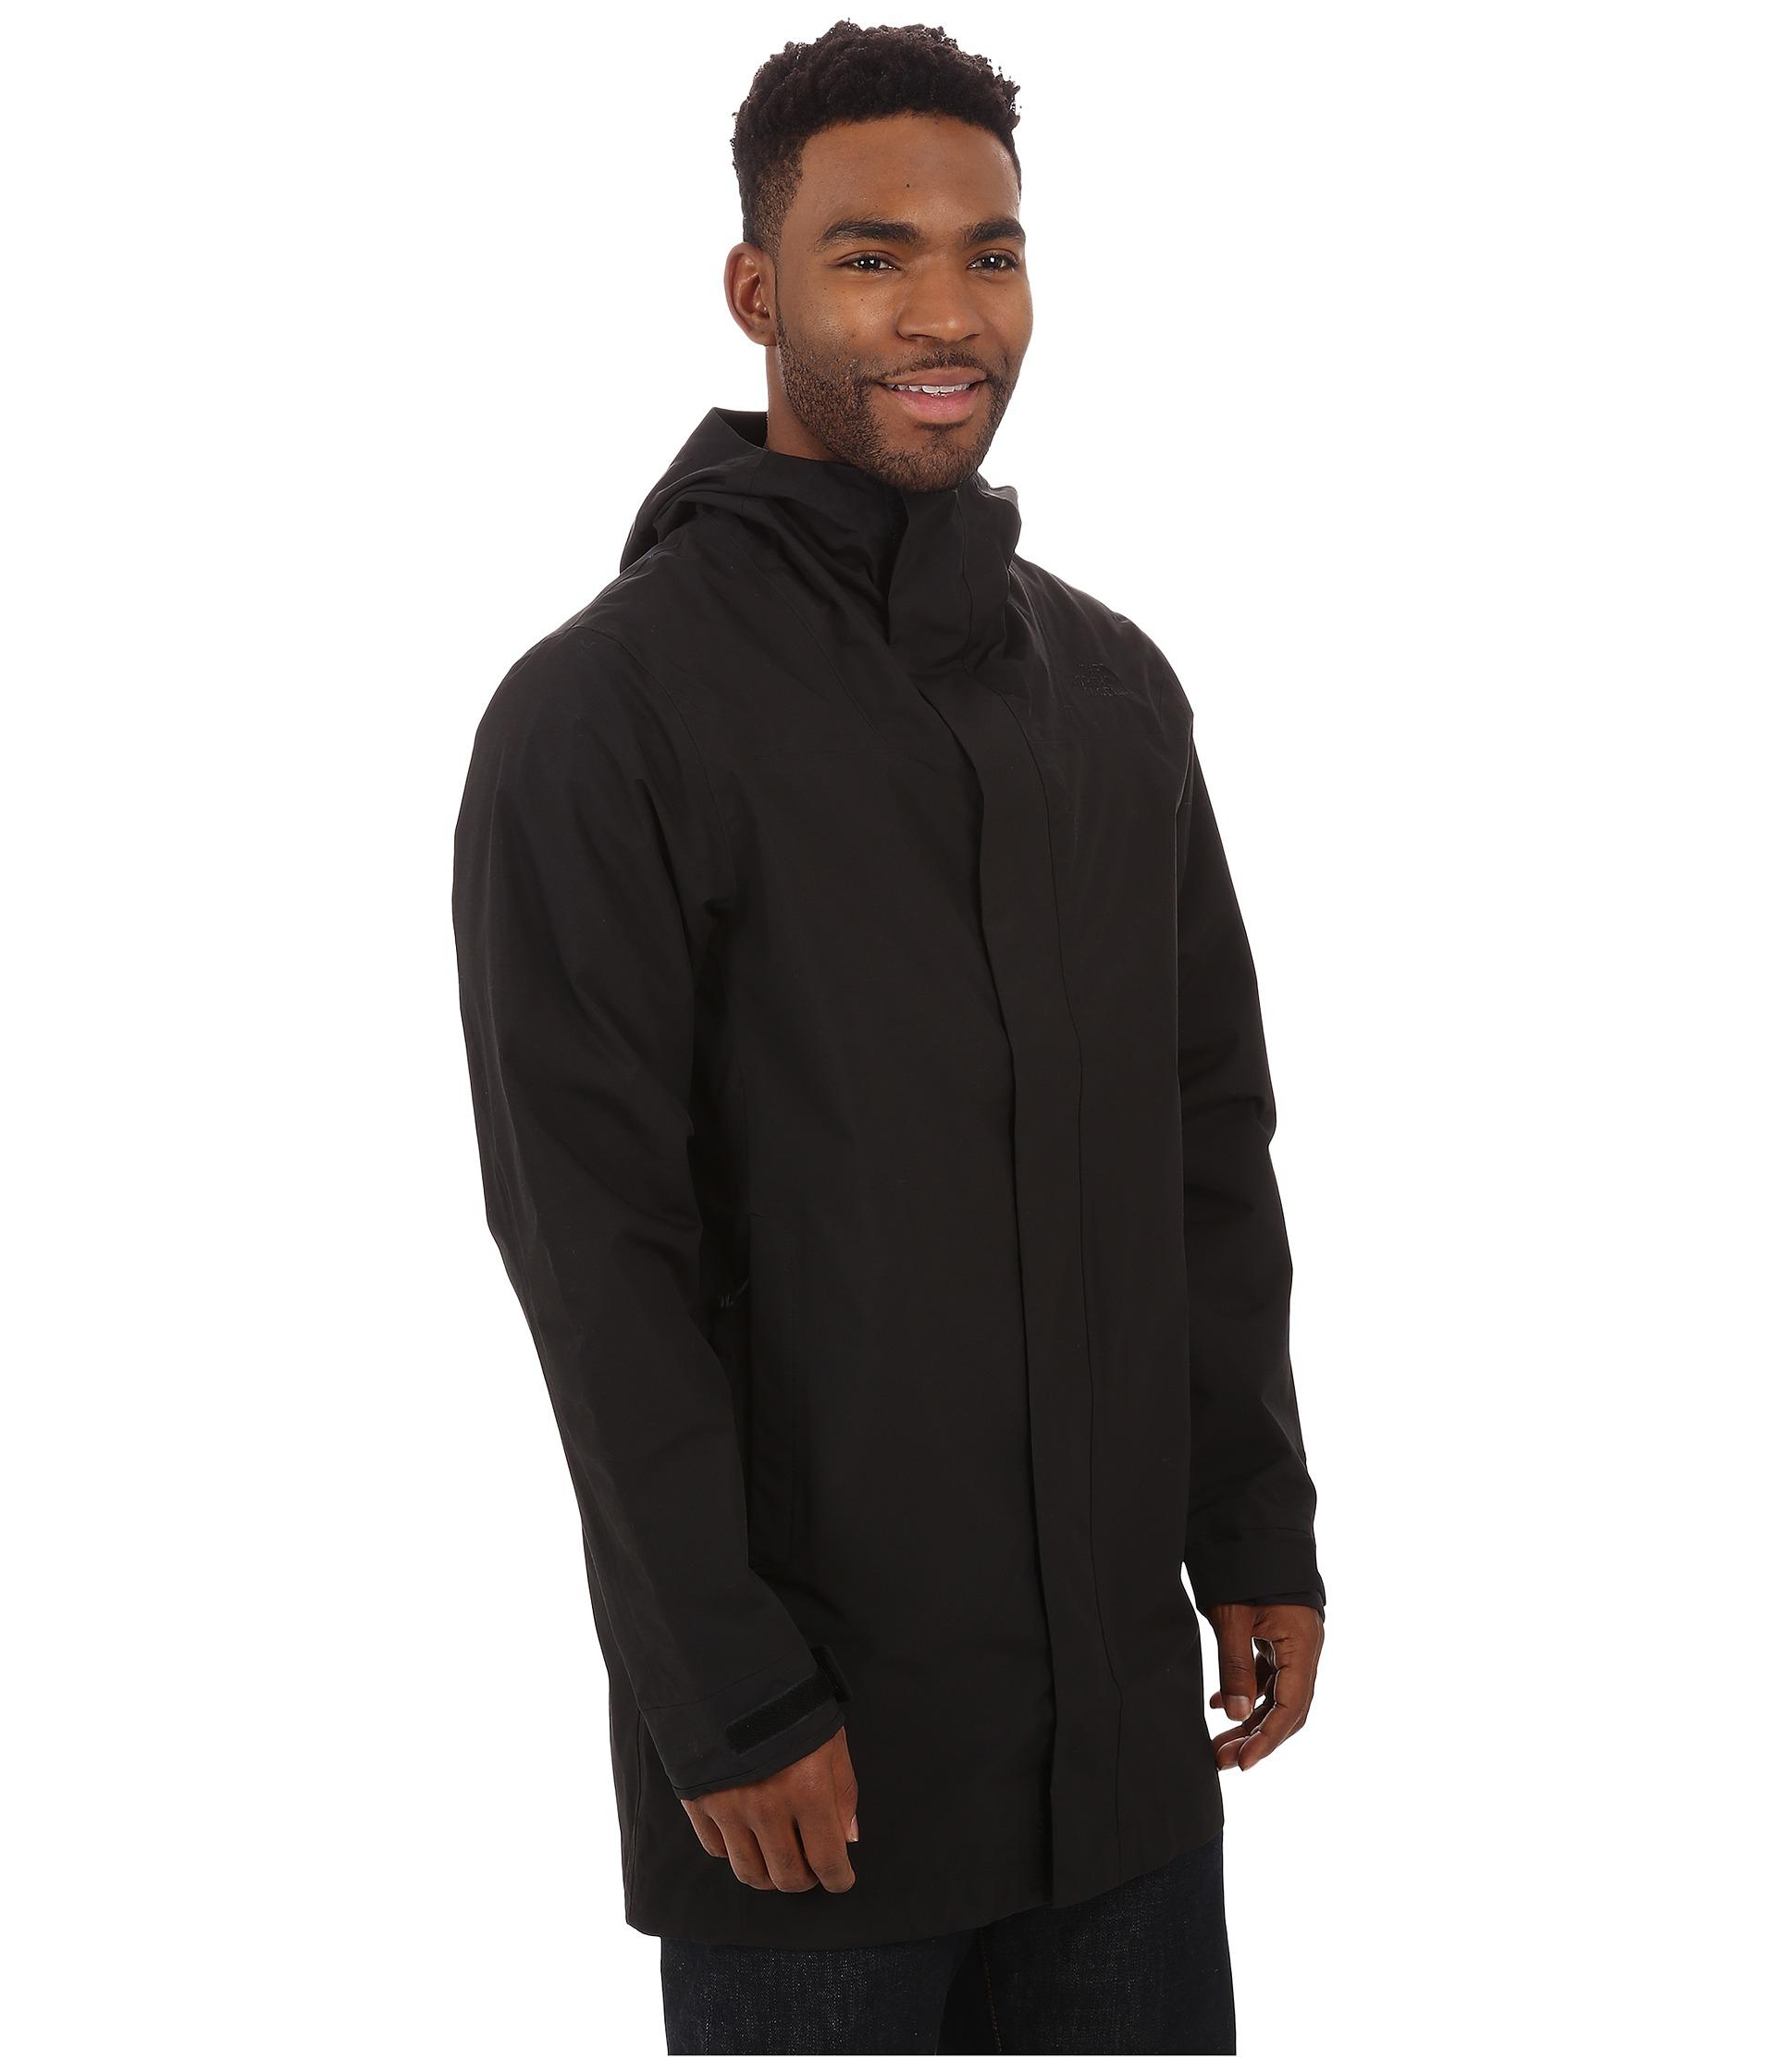 3b9a56f7f The North Face Black El Misti Trench Coat for men